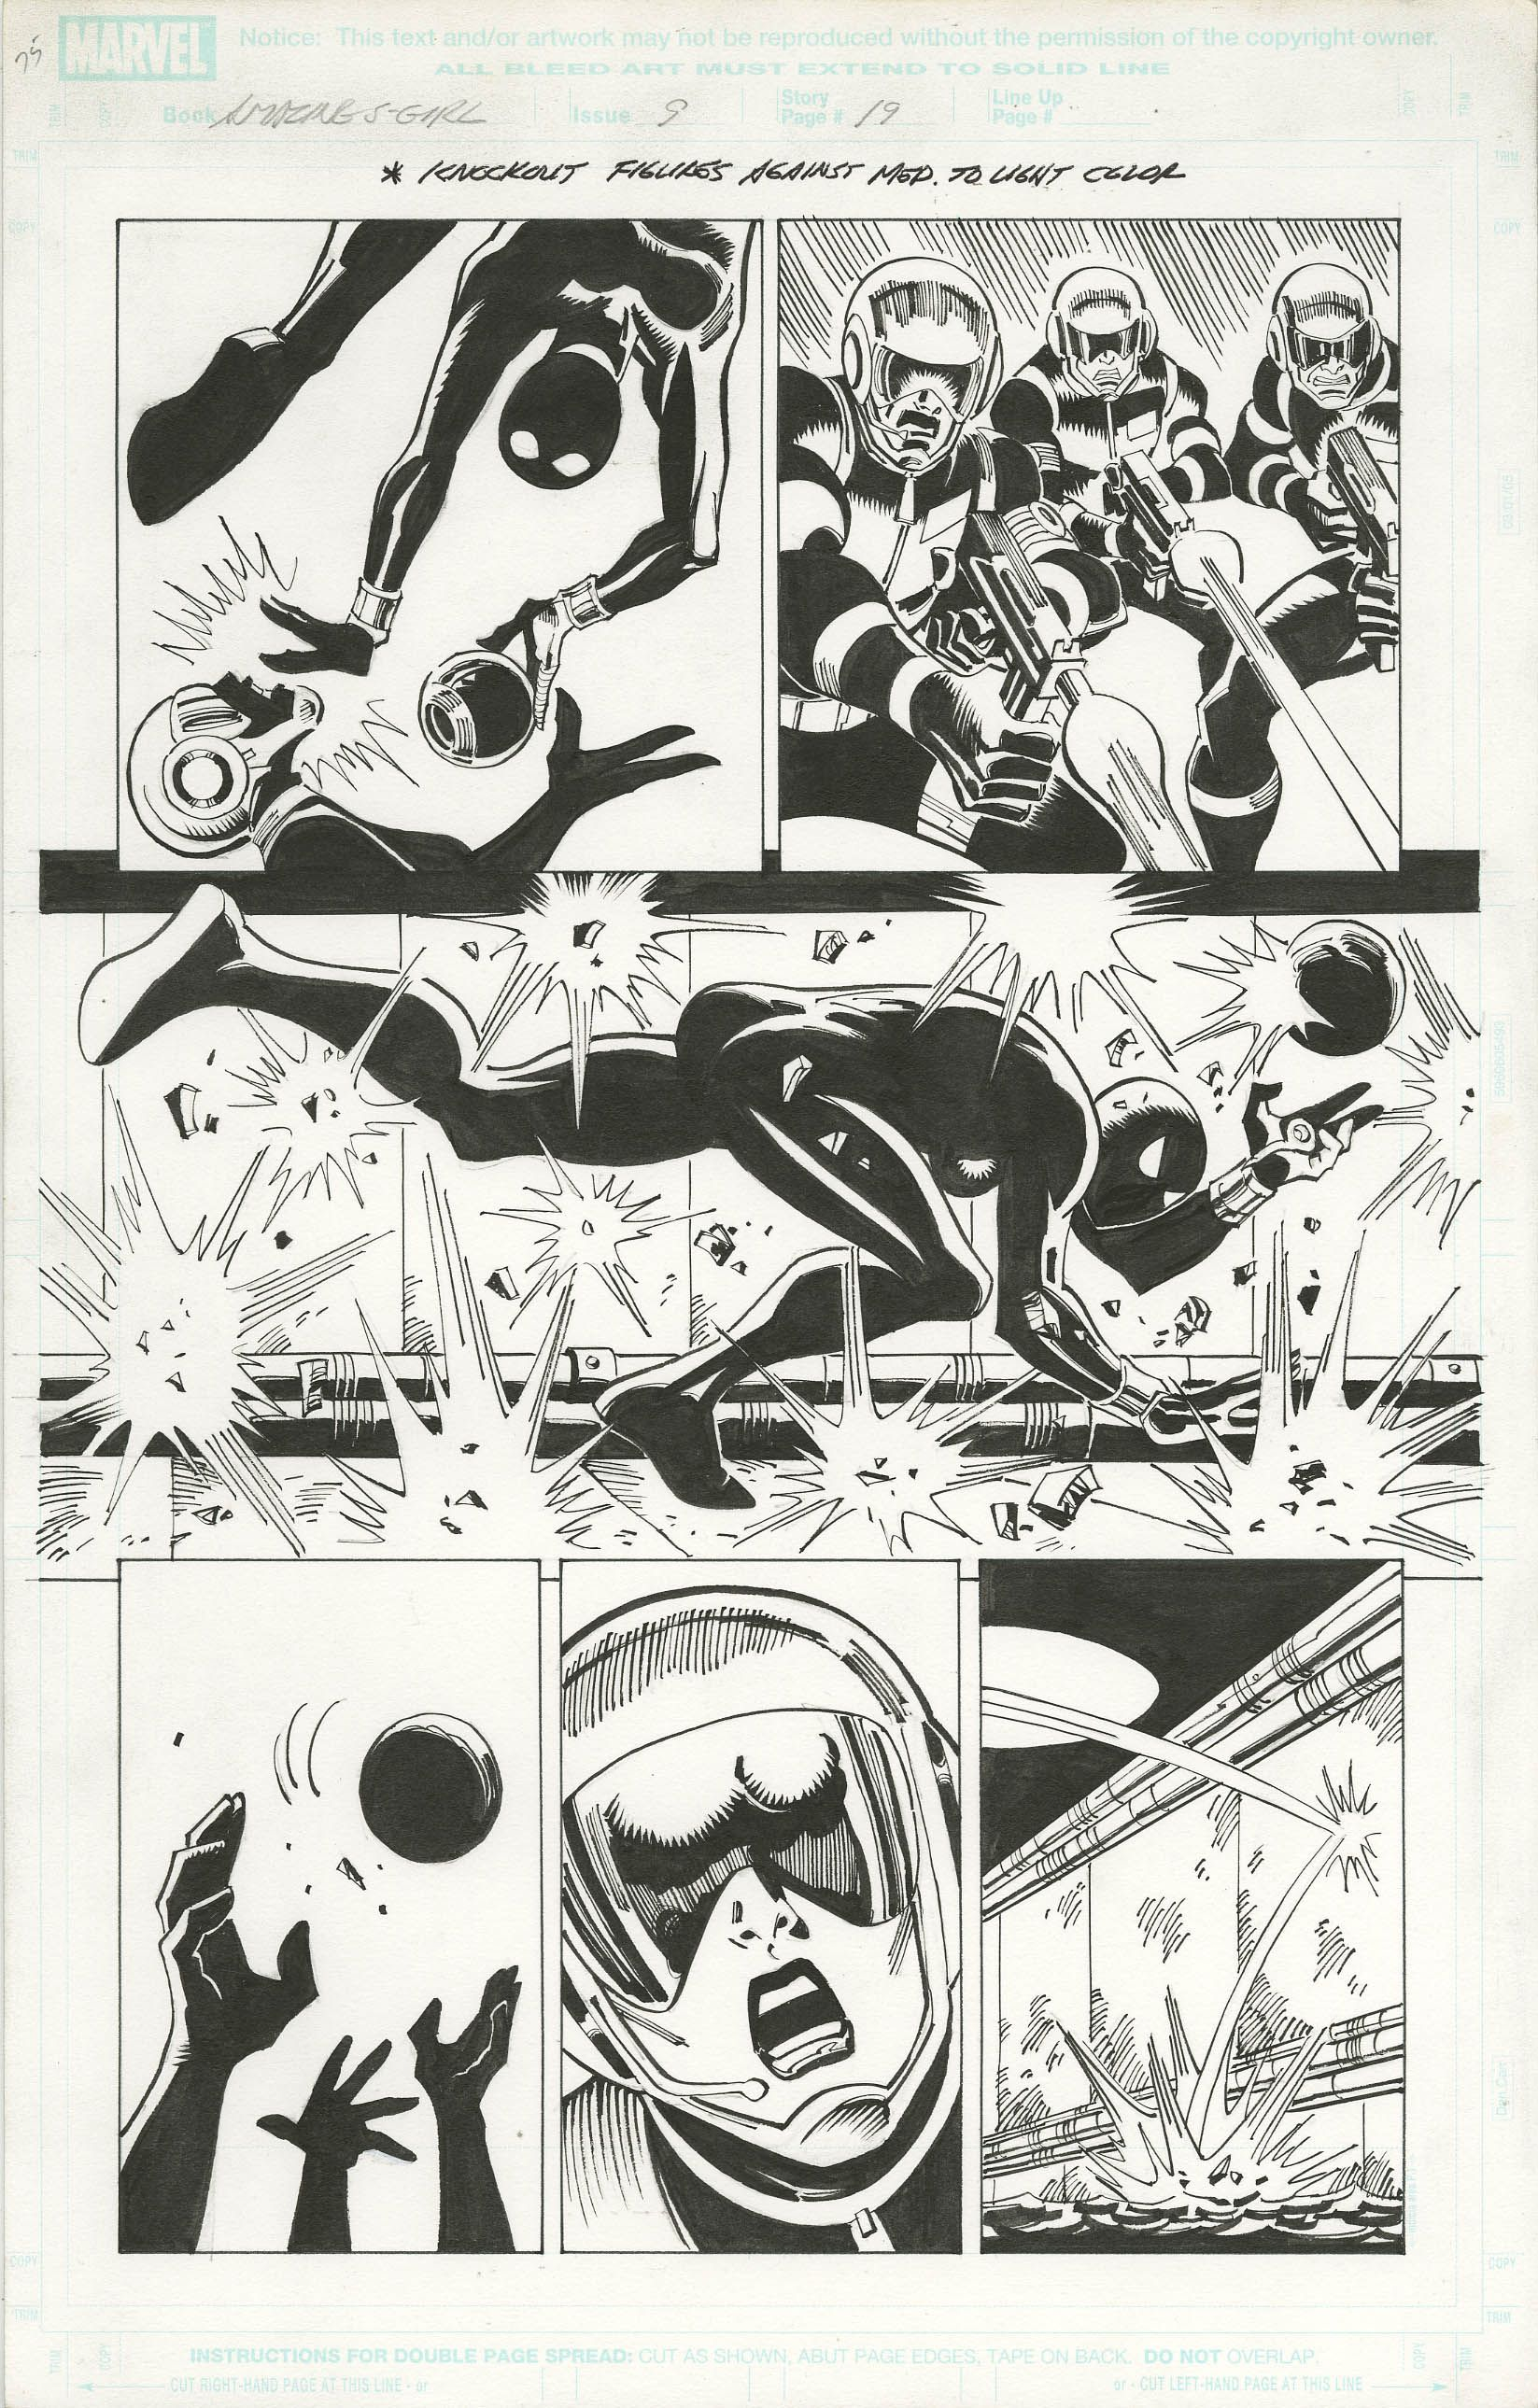 AMAZING SPIDER-GIRL #9 PAGE 19 - RON FRENZ - W.B.